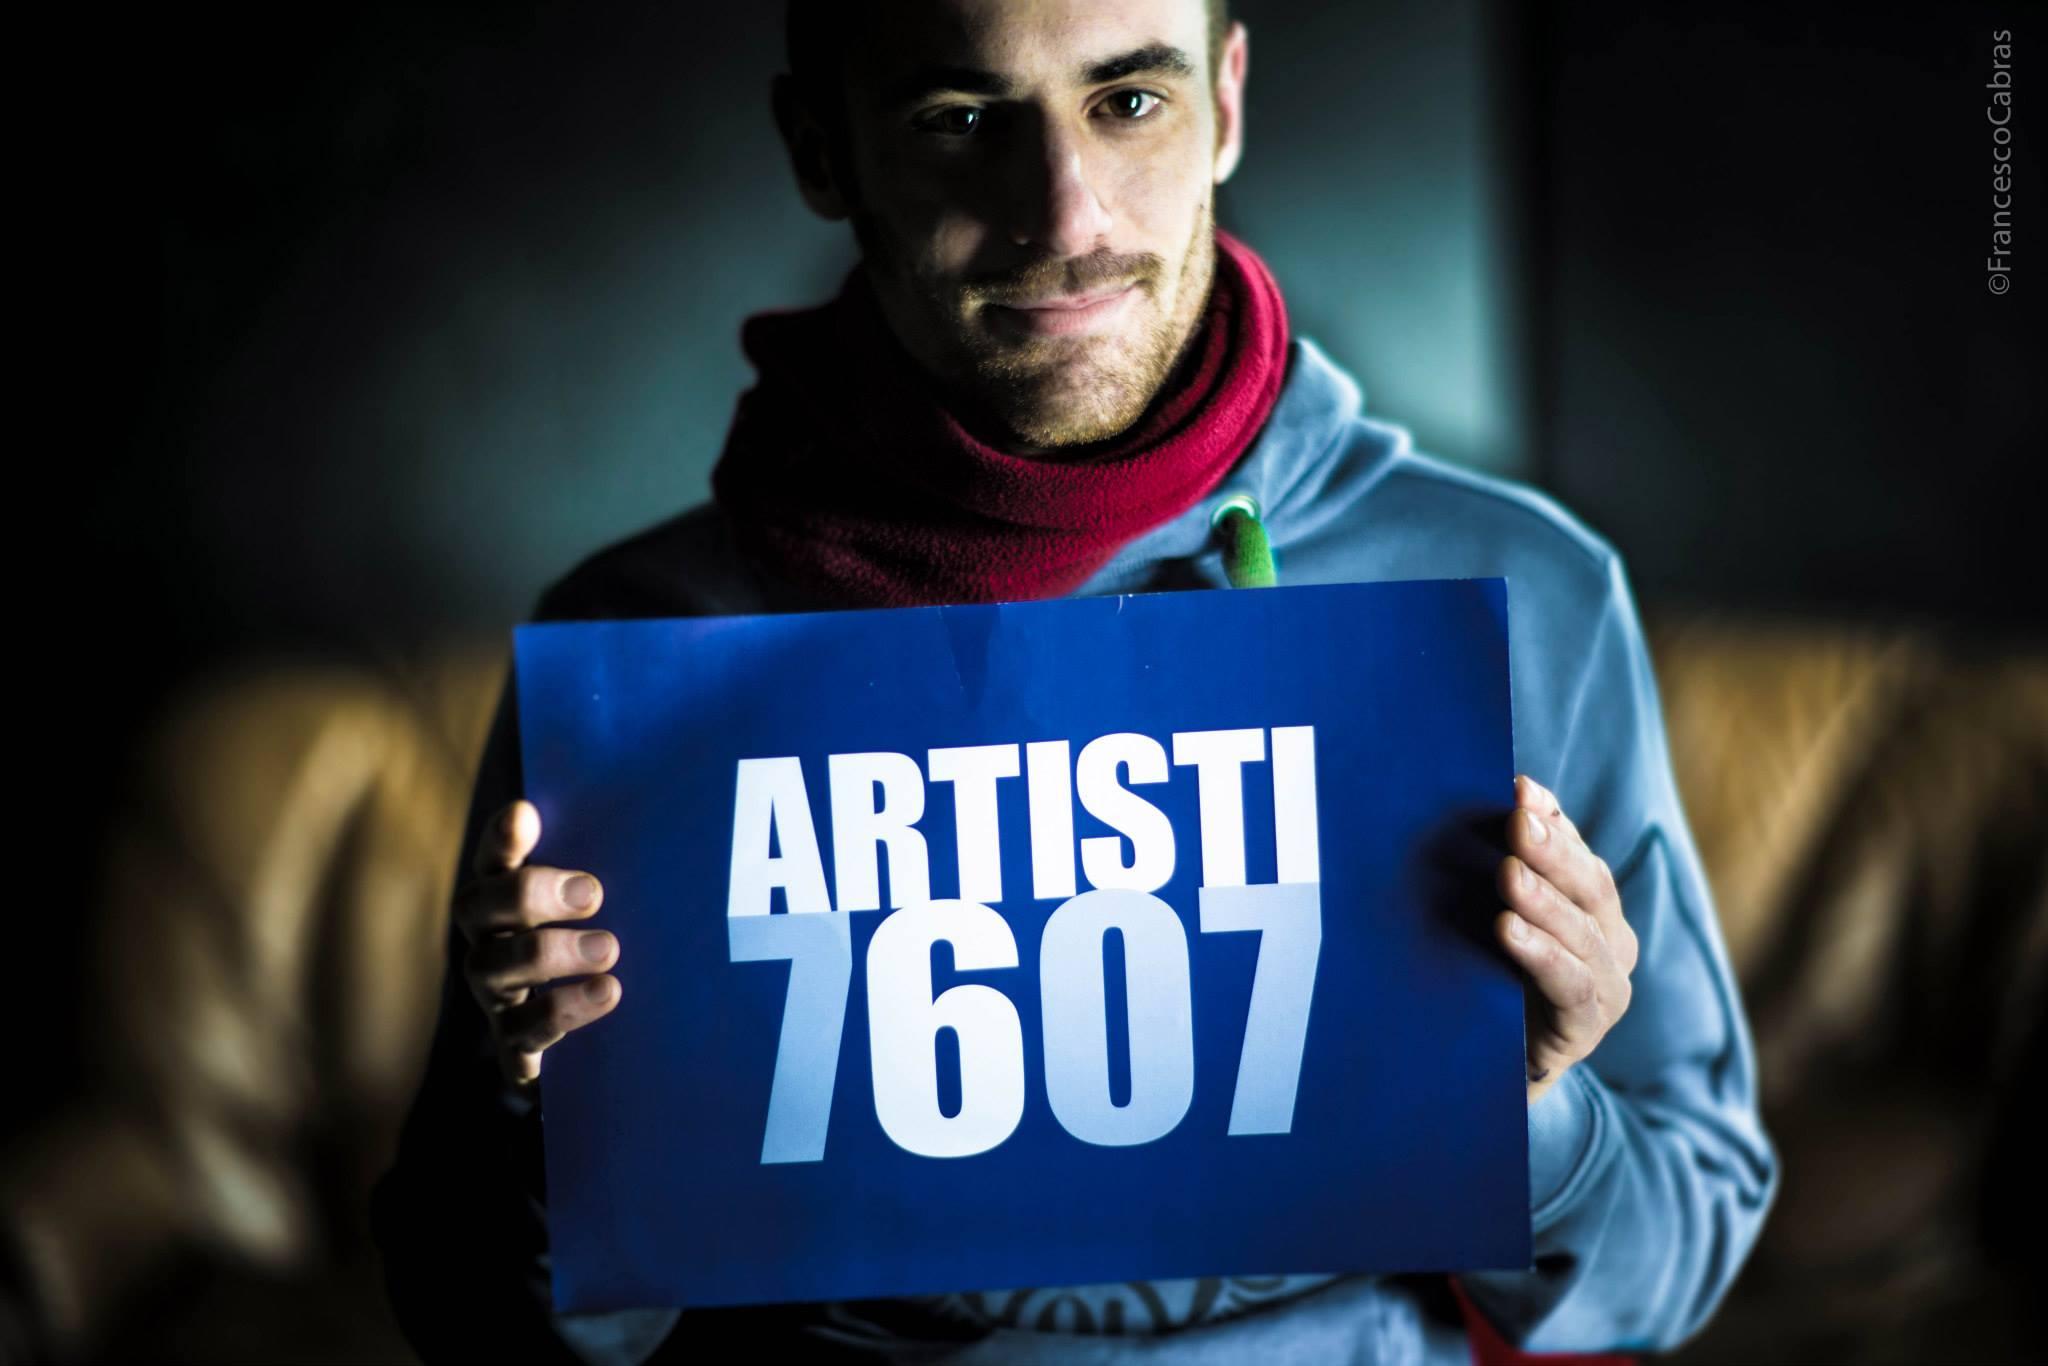 6 Ischia film Festival incontra artisti 7607